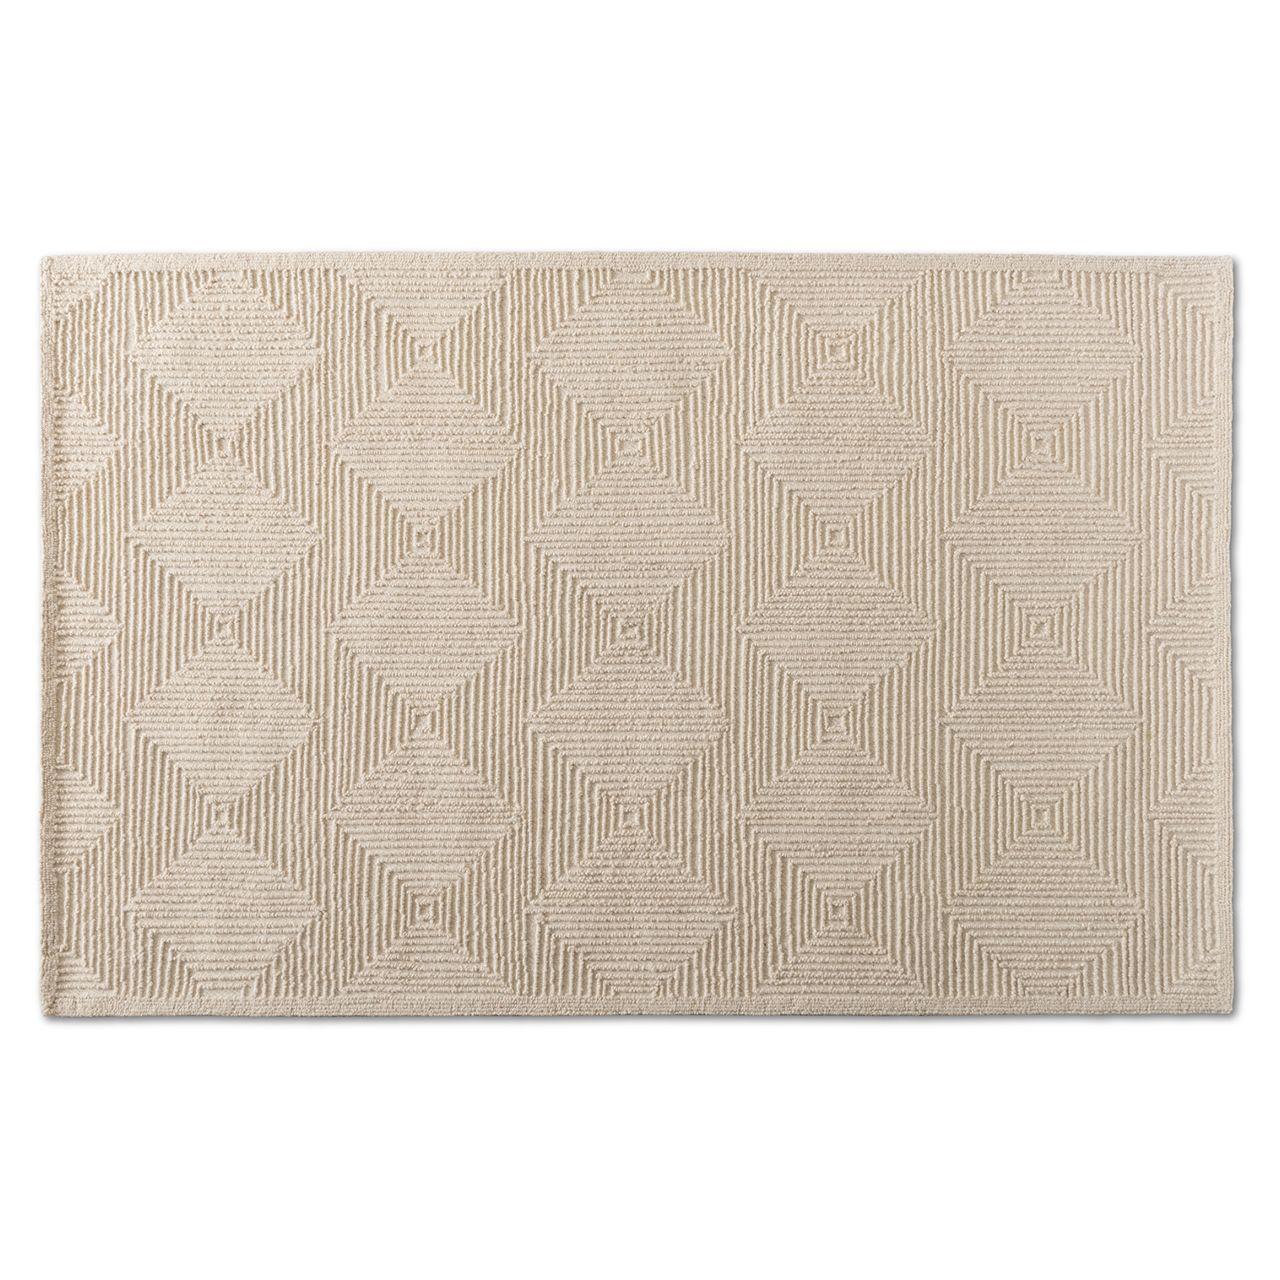 Baxton Studio Sovanna Ivory Hand-Tufted Wool Area Rug